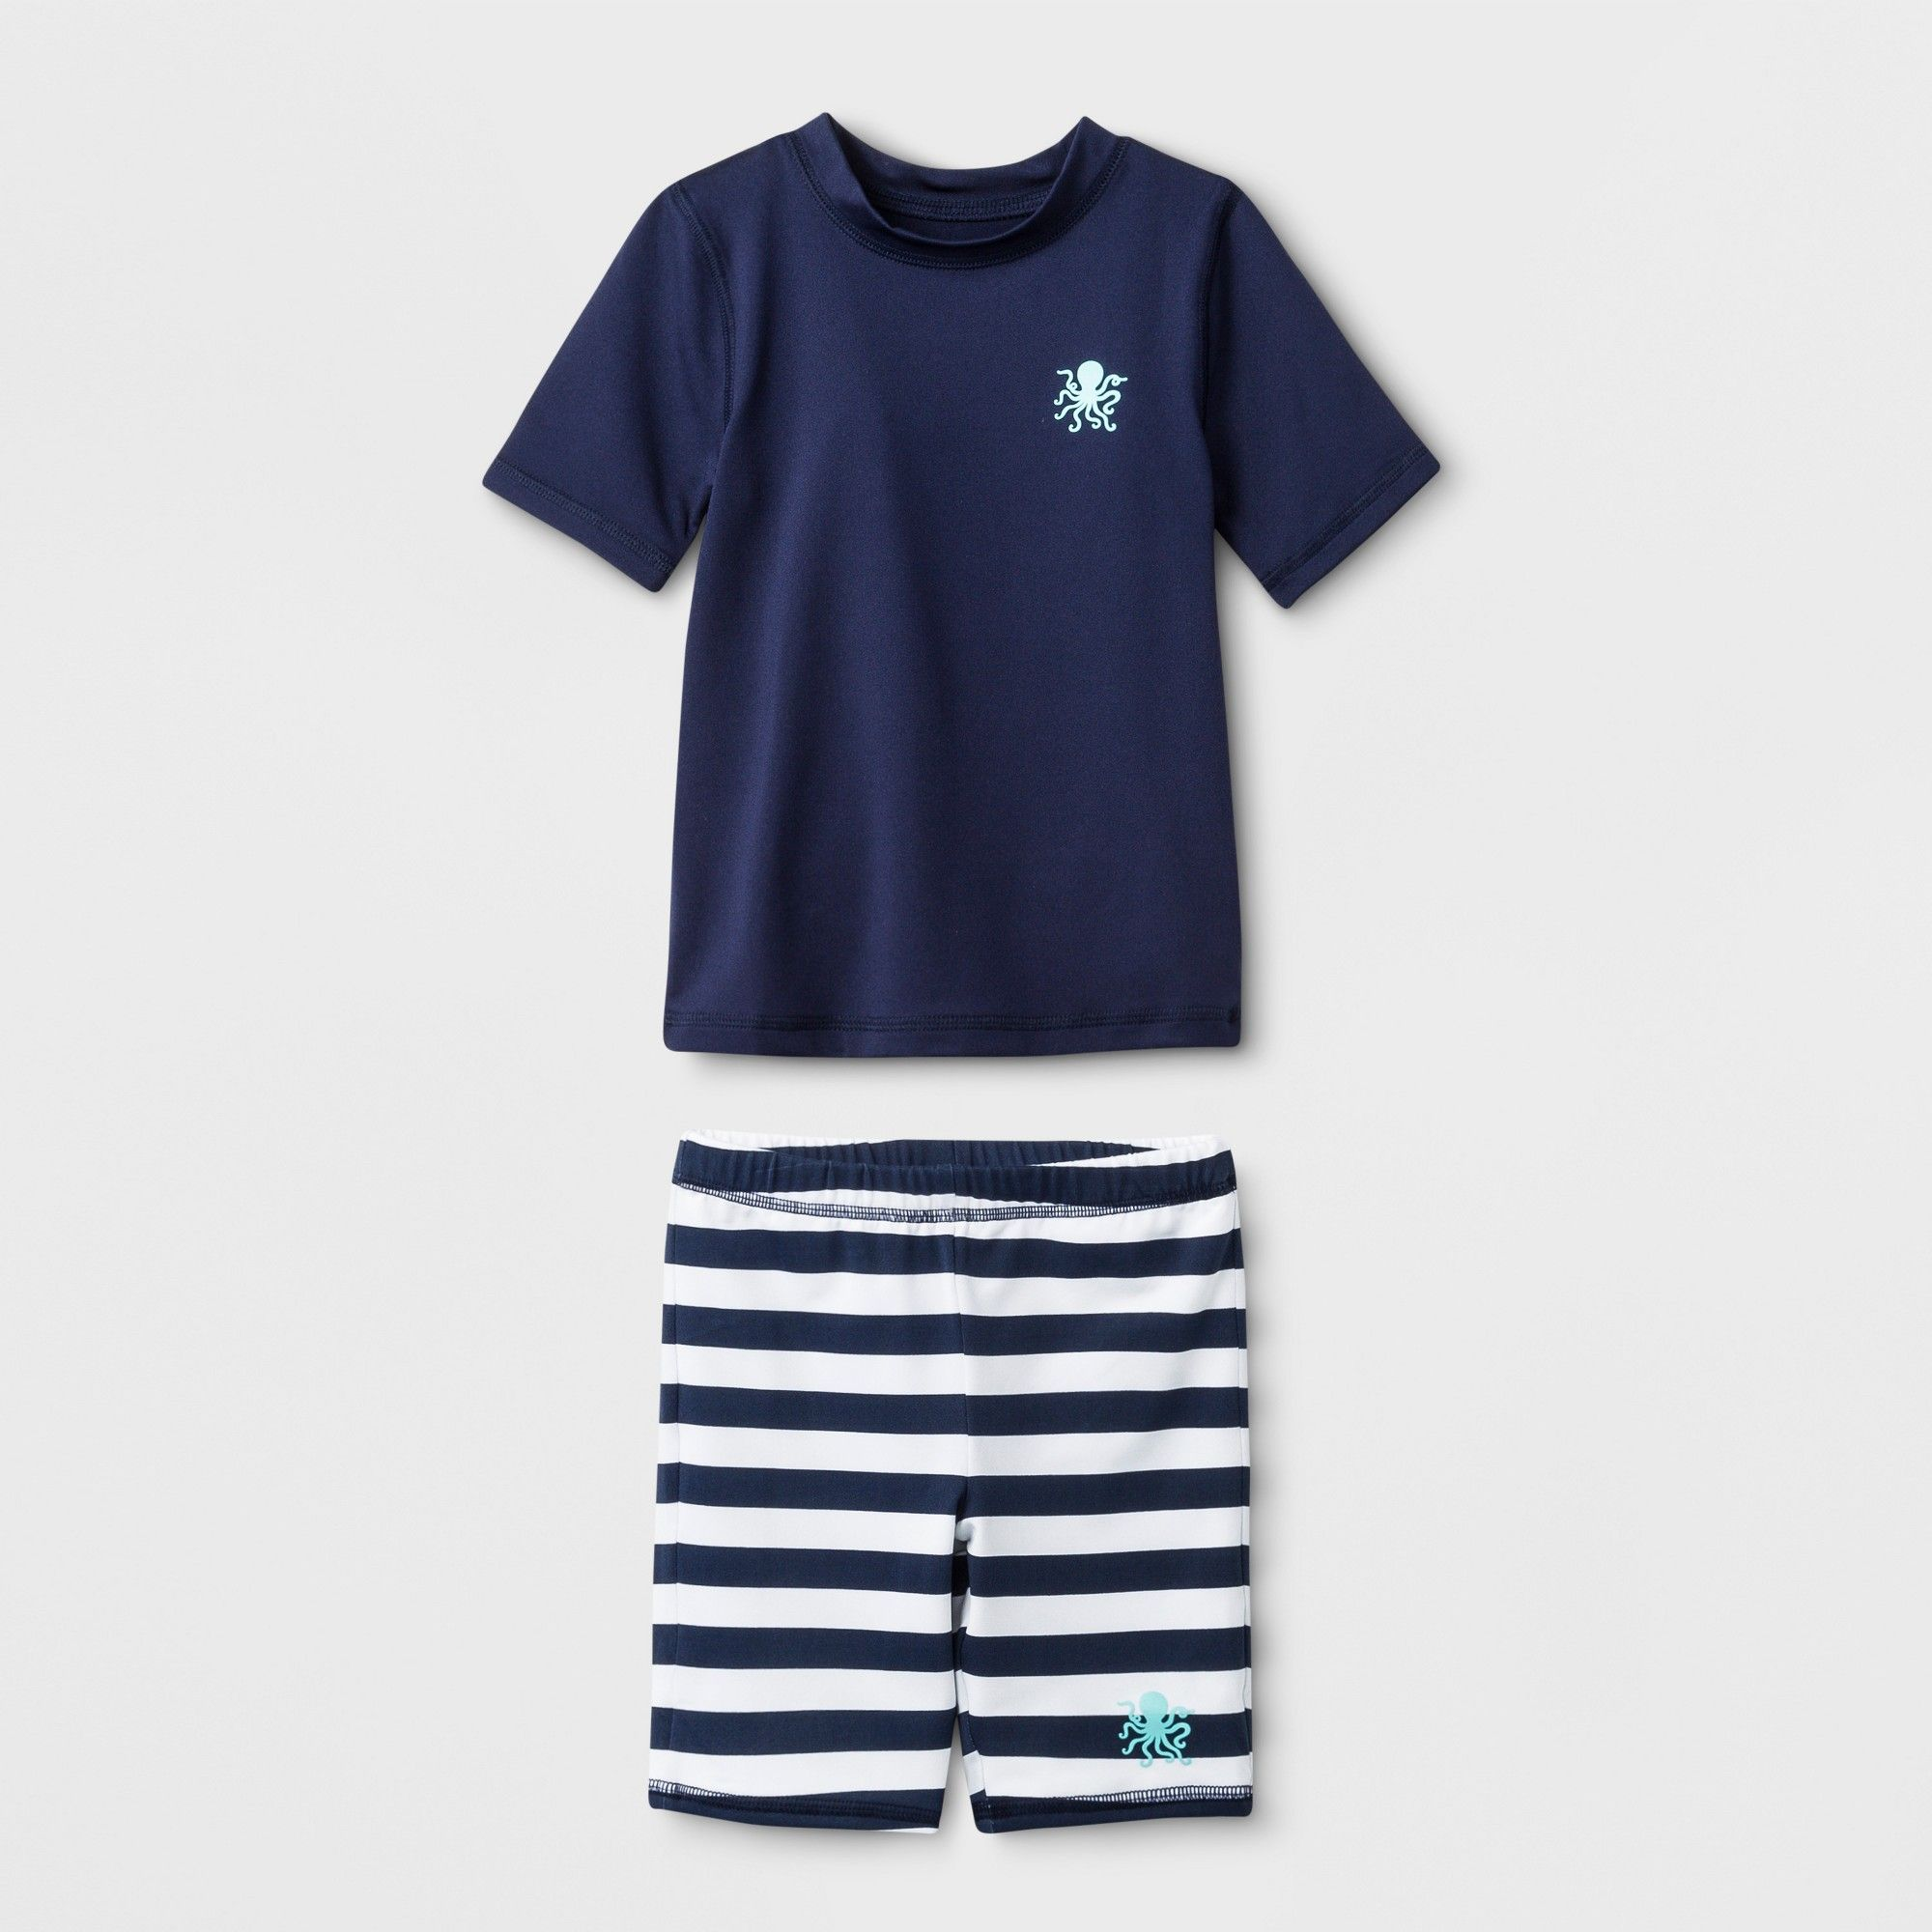 7385cb463cd Toddler Boys  Short Sleeve Rash Guard with Shorts - Cat   Jack Navy ...